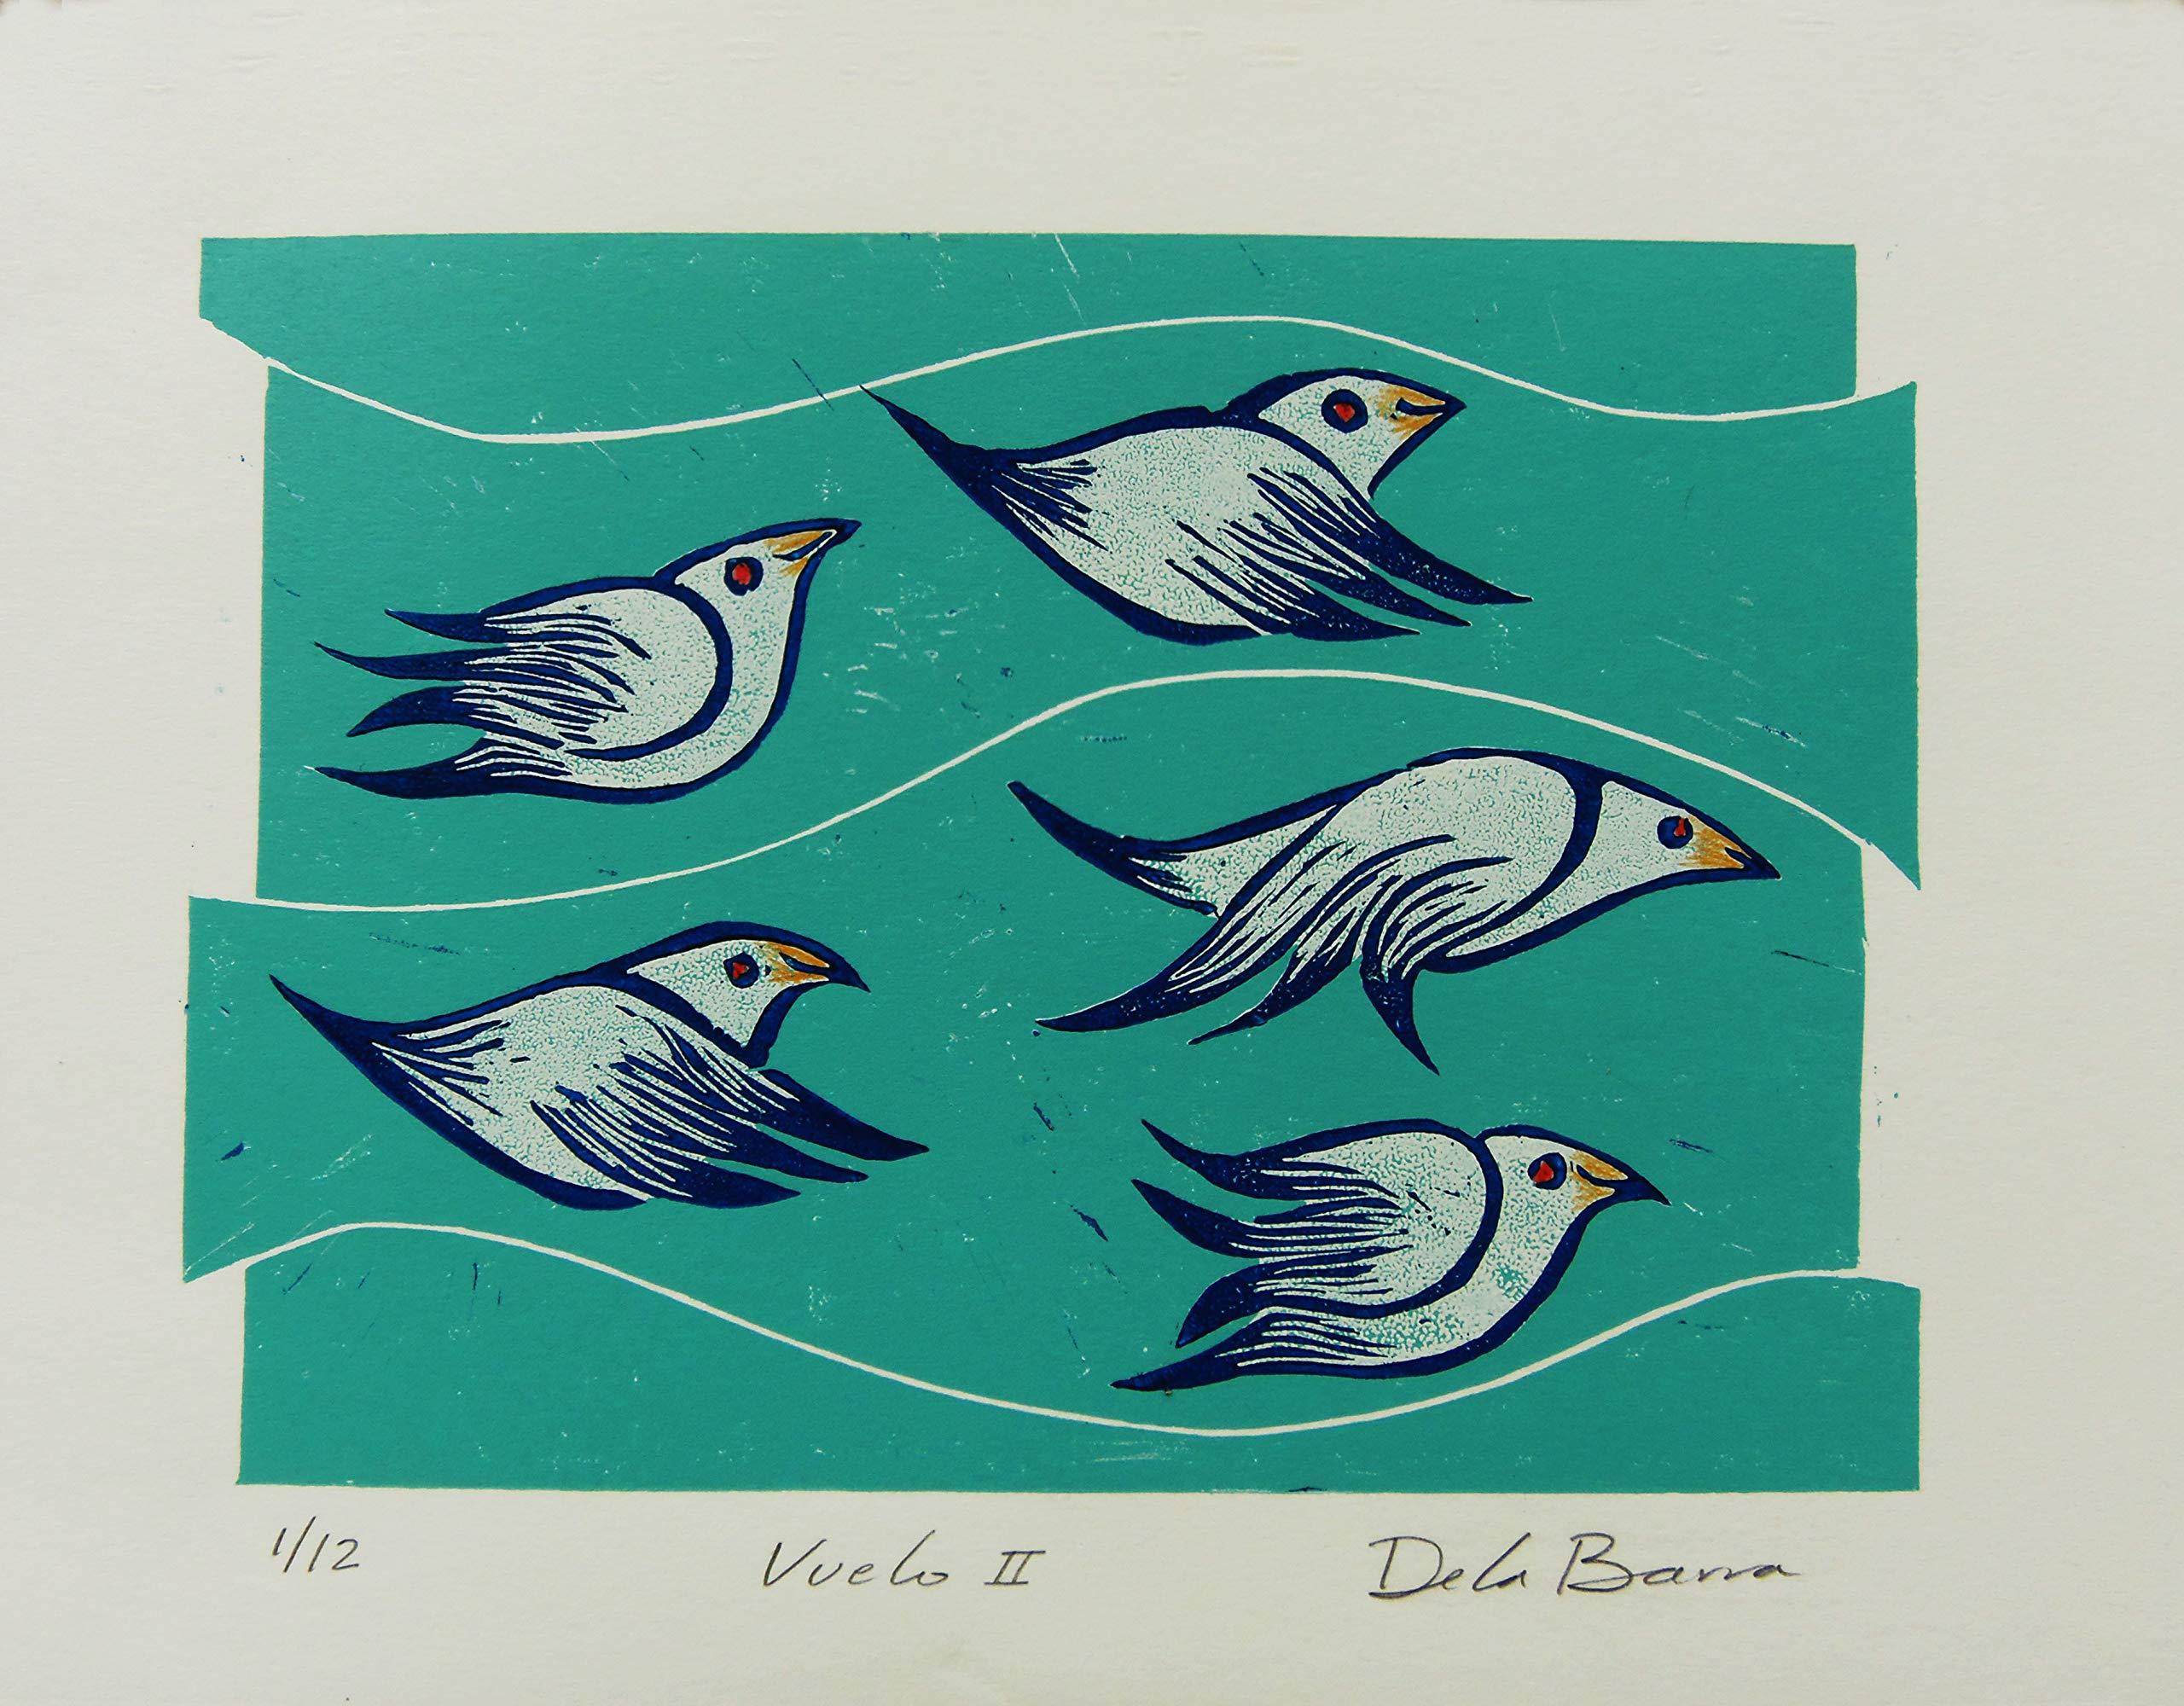 Vuelo II Original print linocut on paper by